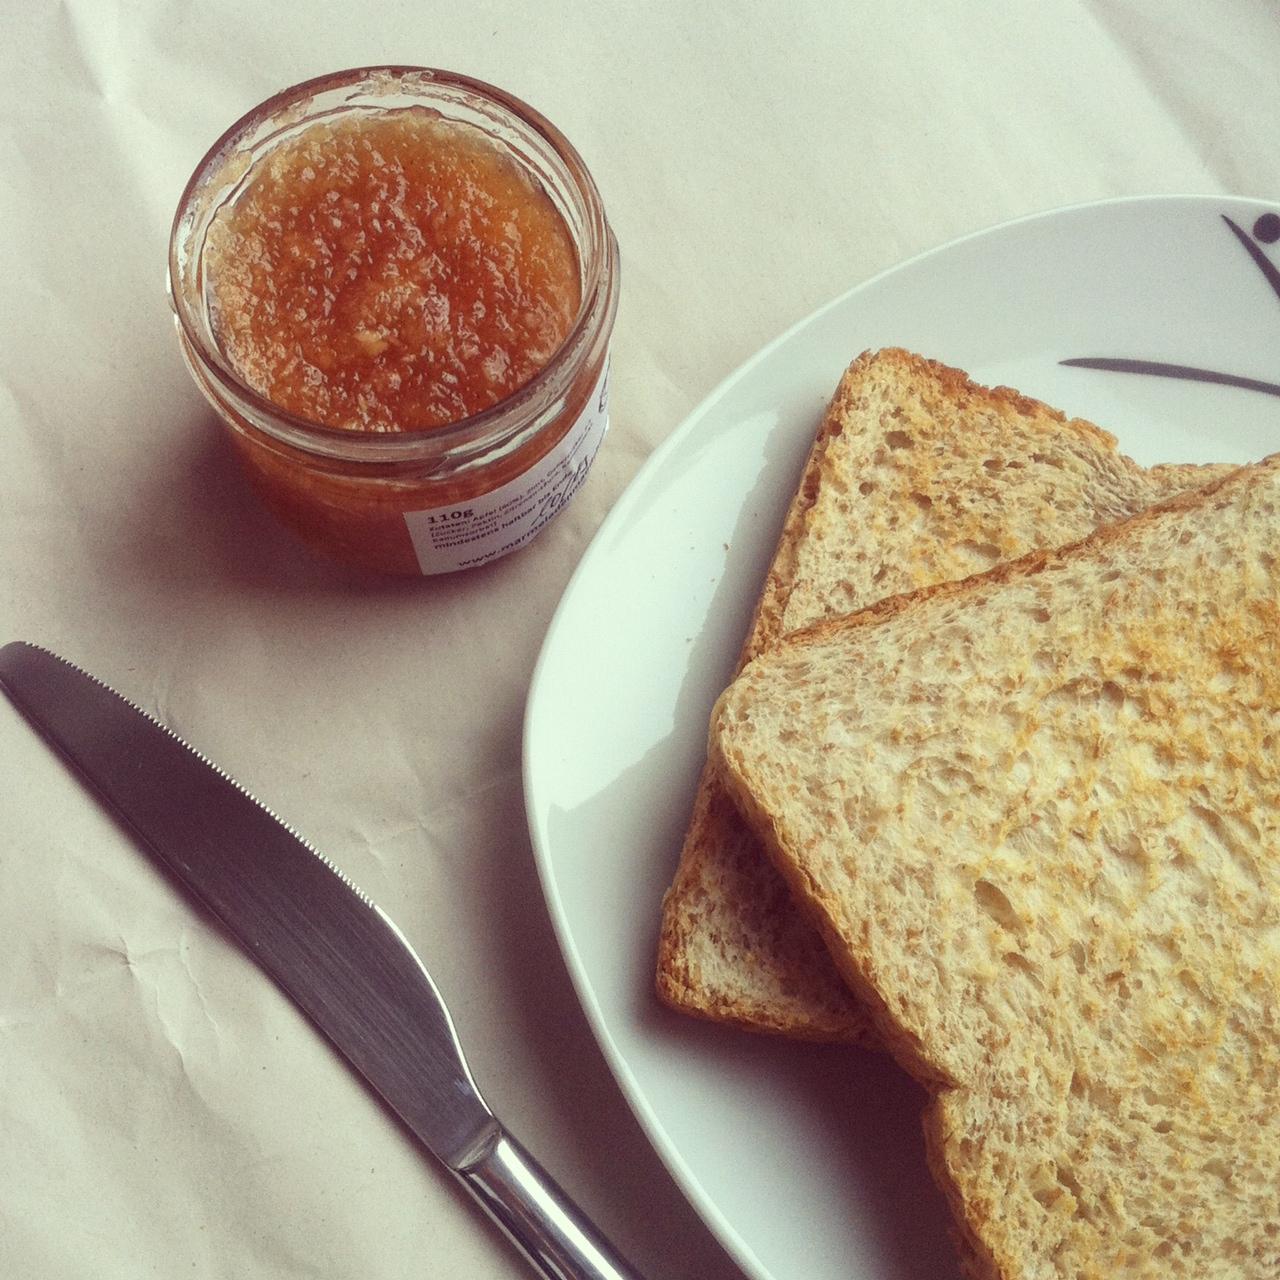 yum yum hausgemachte marmelade vom marmeladenm dchen missbonn e bonn e. Black Bedroom Furniture Sets. Home Design Ideas